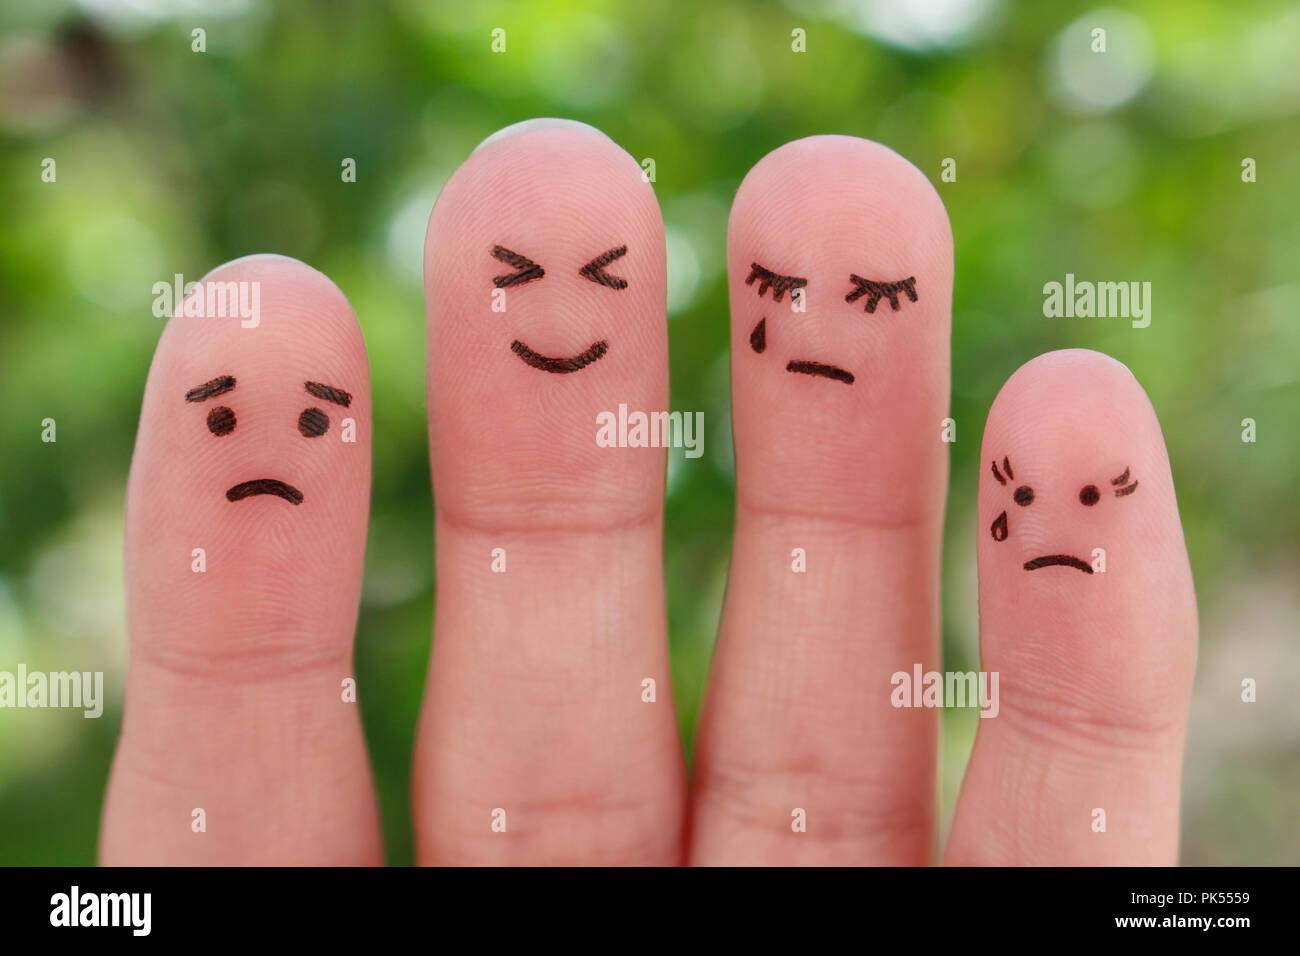 Finger Kunst des Menschen. Pessimisten und Optimisten. Stockbild